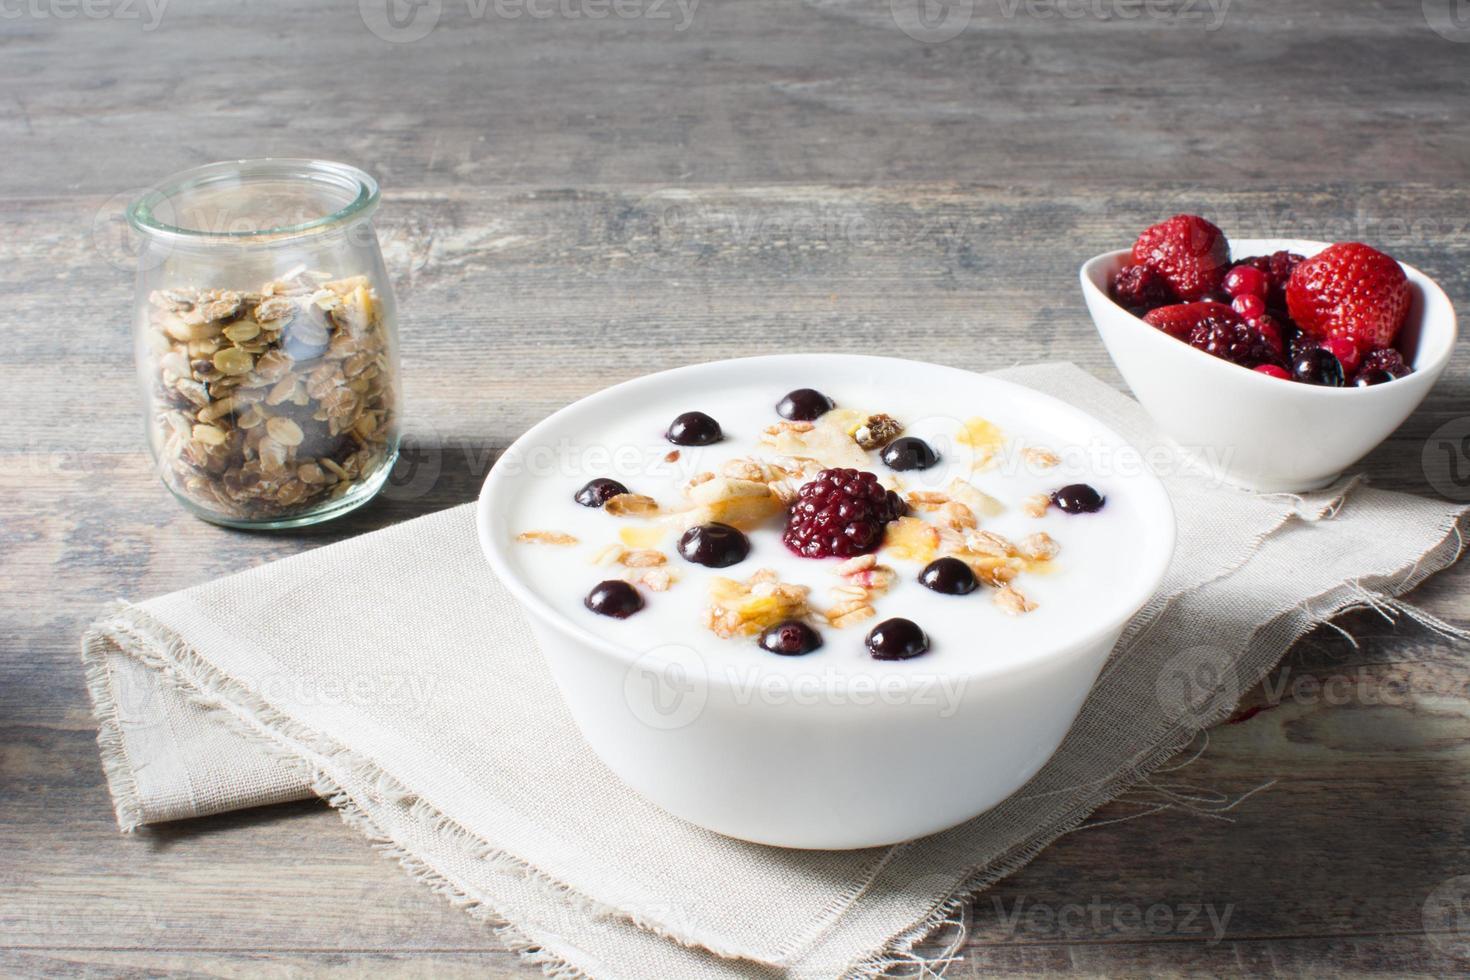 yogurt naturale con frutti di bosco freschi foto